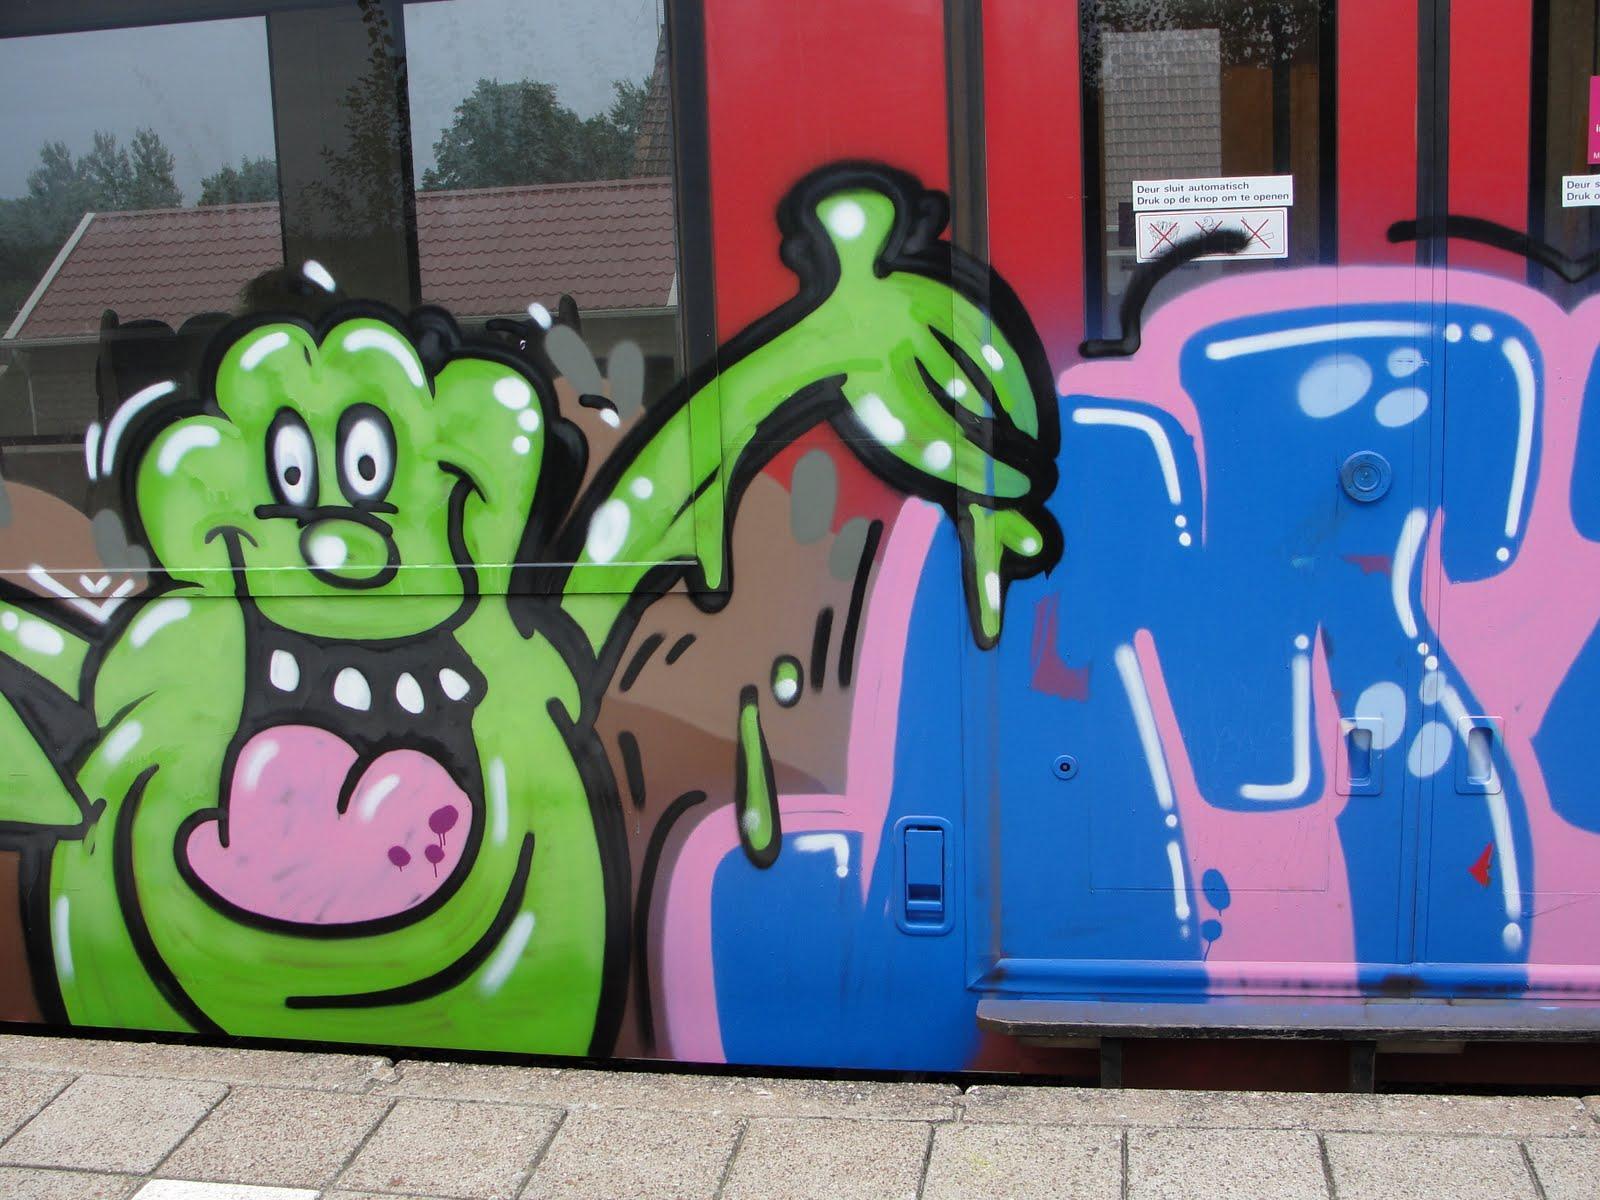 NS jaagt op graffitispuiters met drones